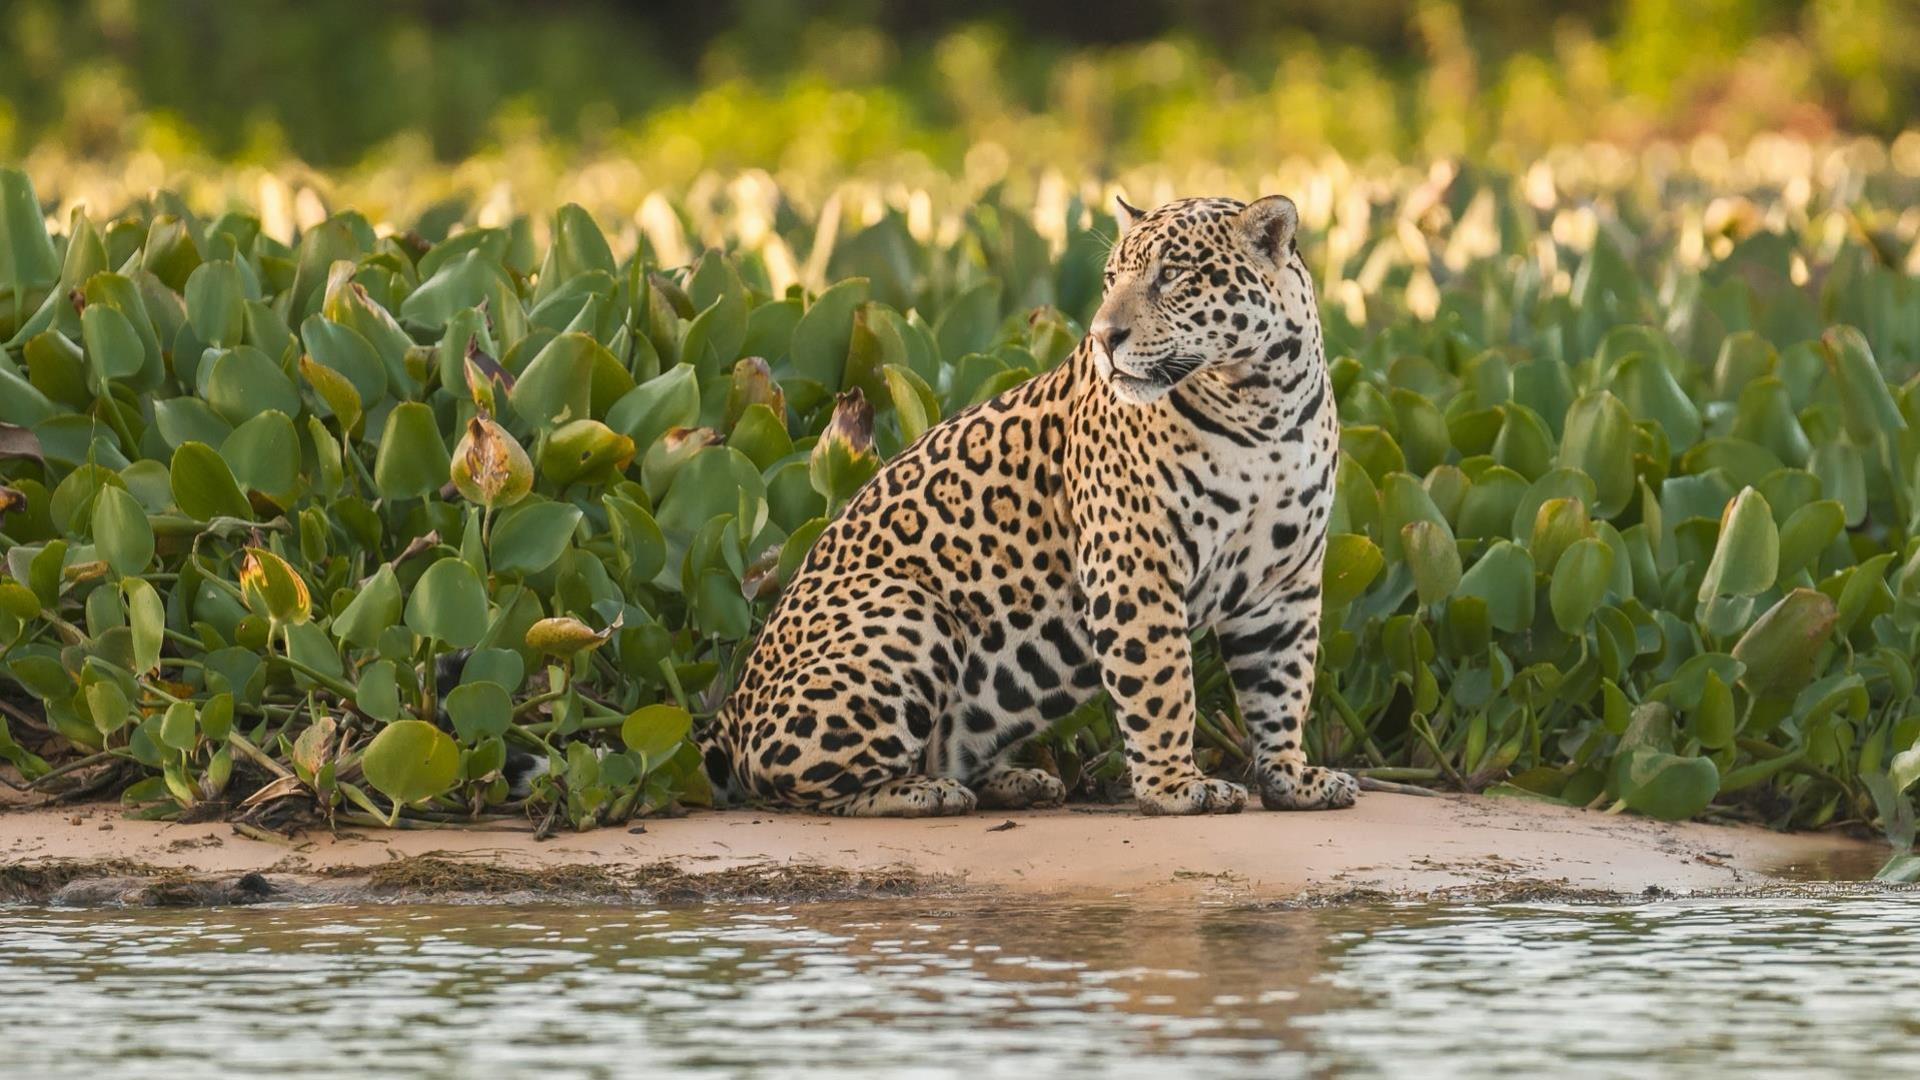 Brasilien Nord Pantanal: 4 Tage Reisebaustein - Jaguar Expedition intensiv: Jaguar